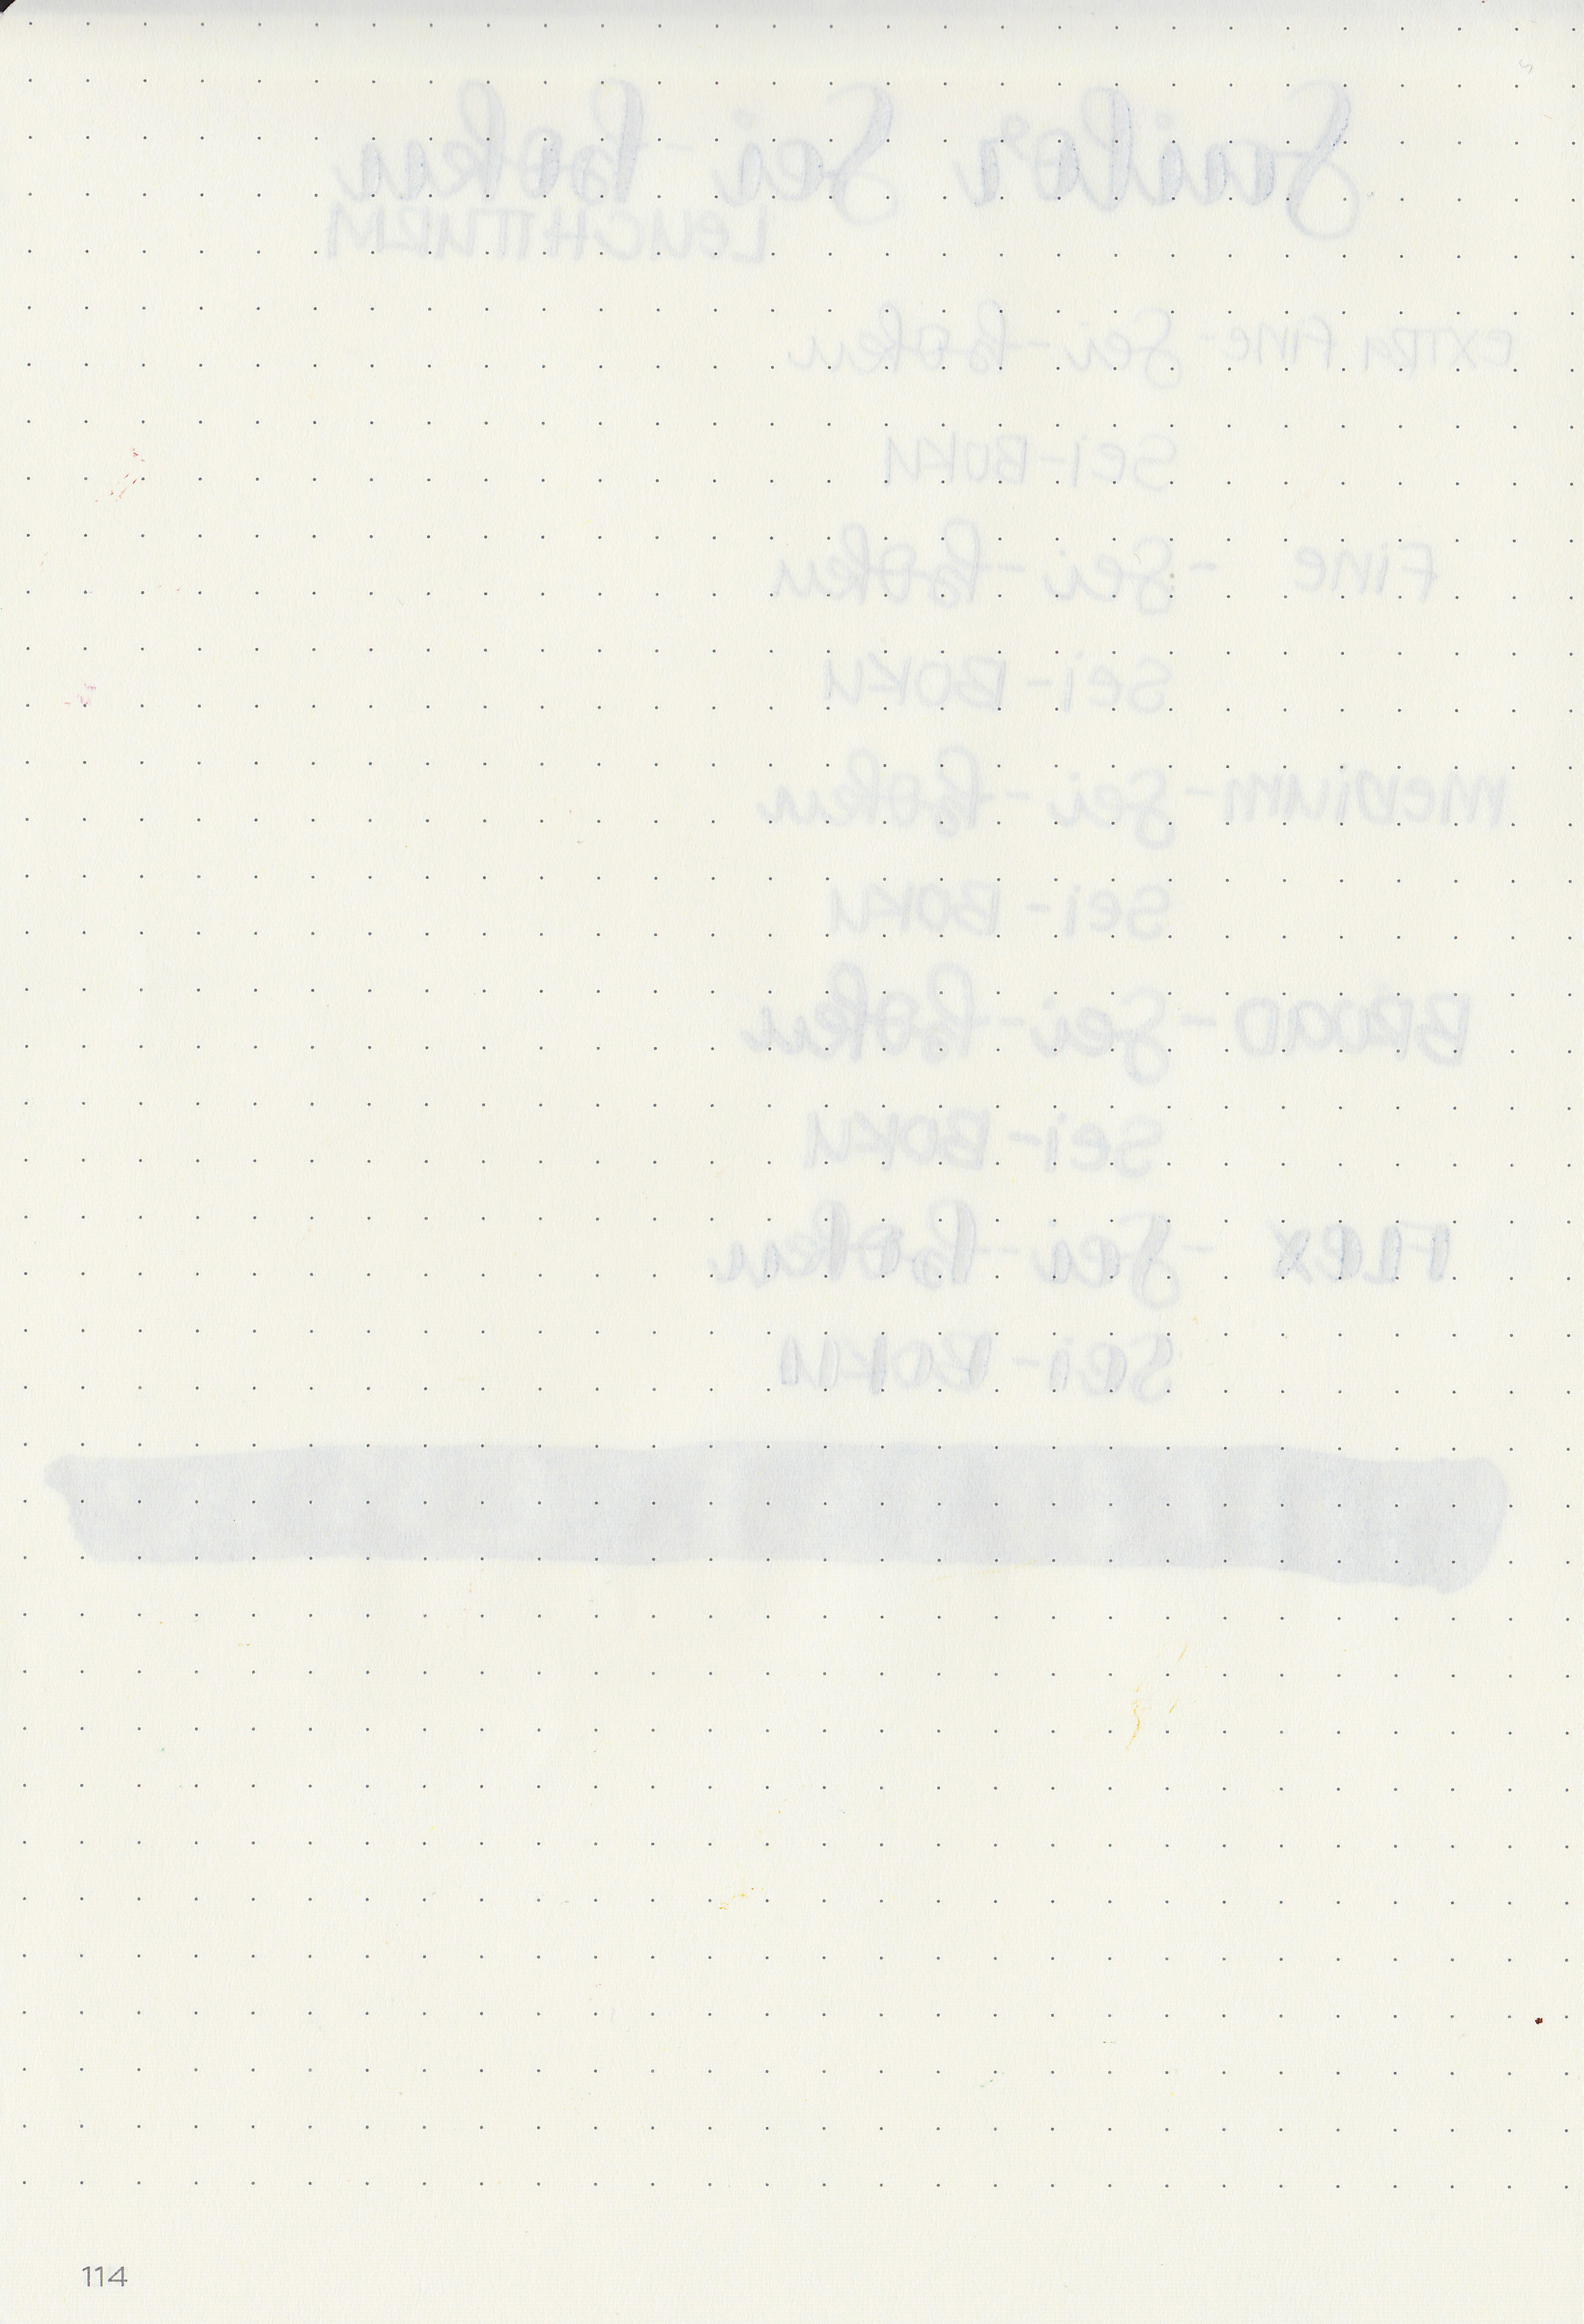 sj-sei-boku-14.jpg